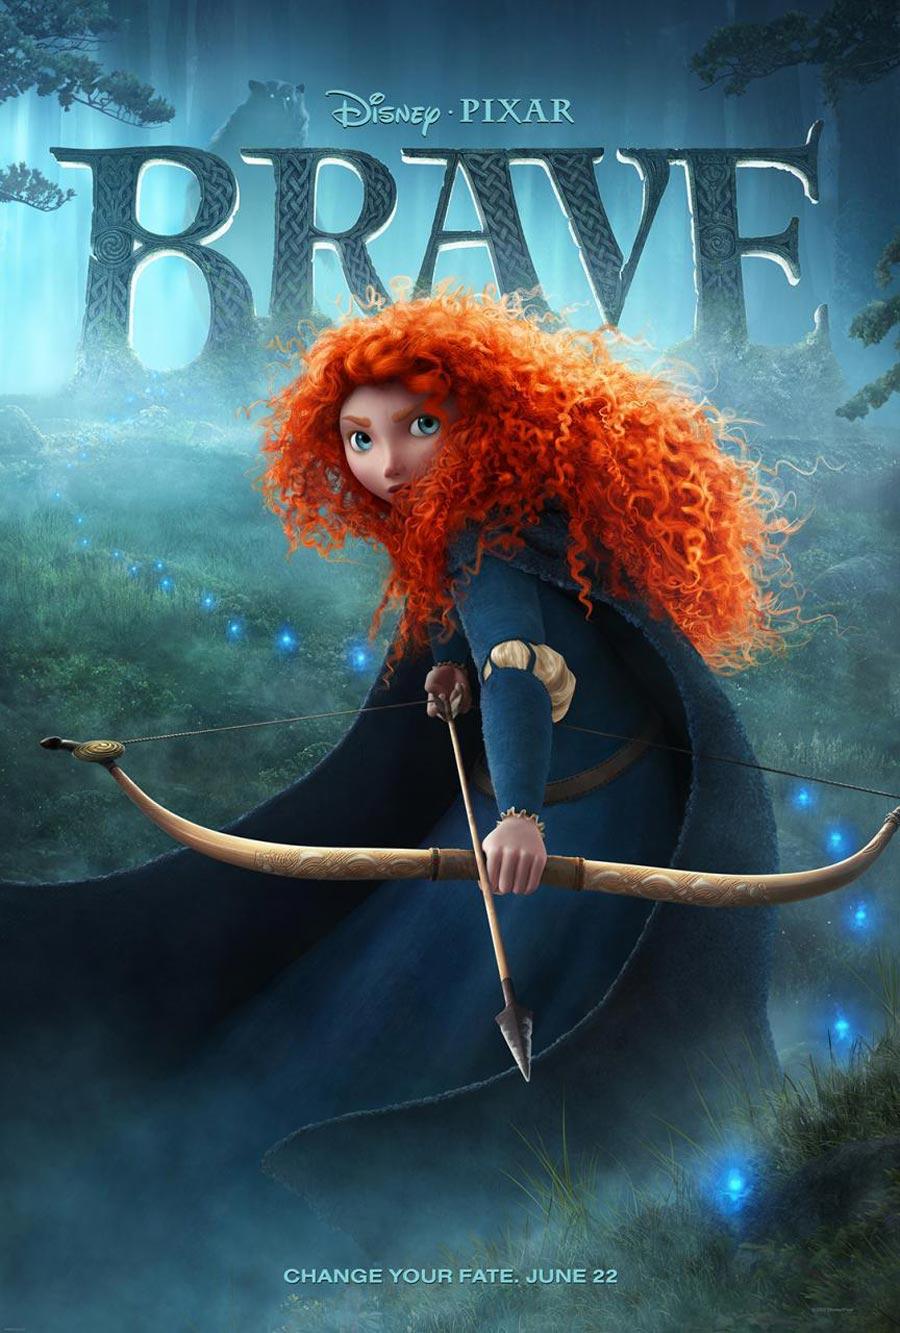 http://www.filmofilia.com/wp-content/uploads/2012/02/Brave_poster.jpg